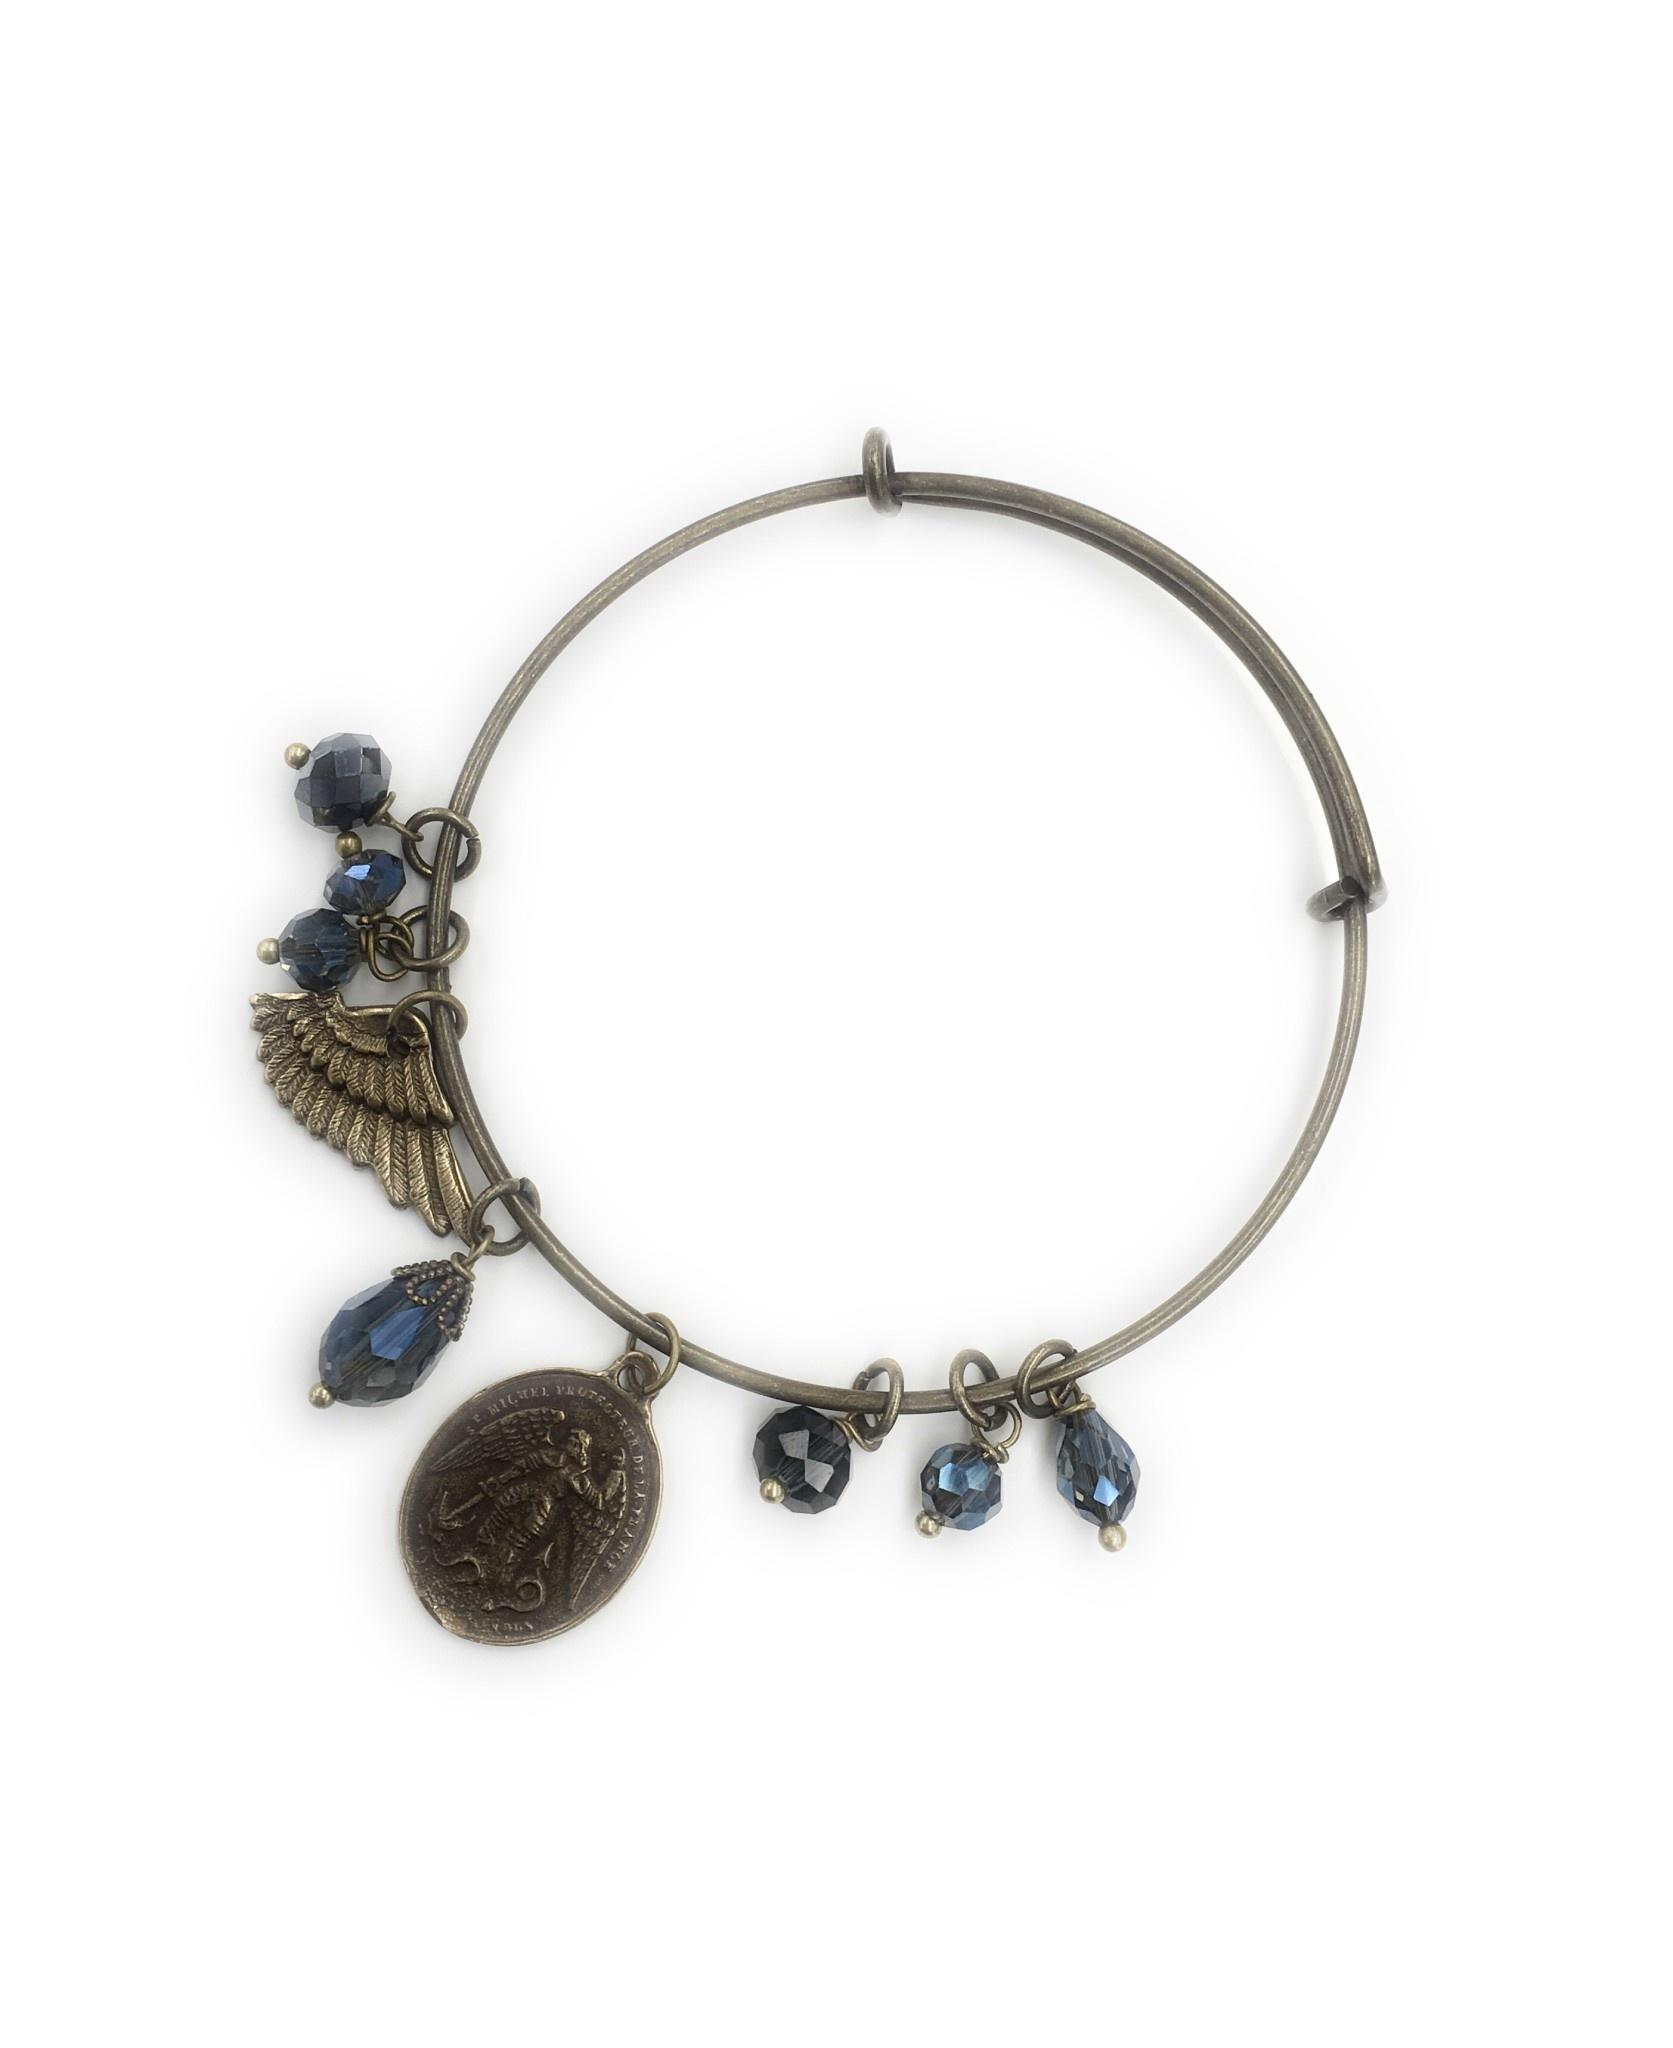 Gail's Design St. Michel Bangle Bracelet